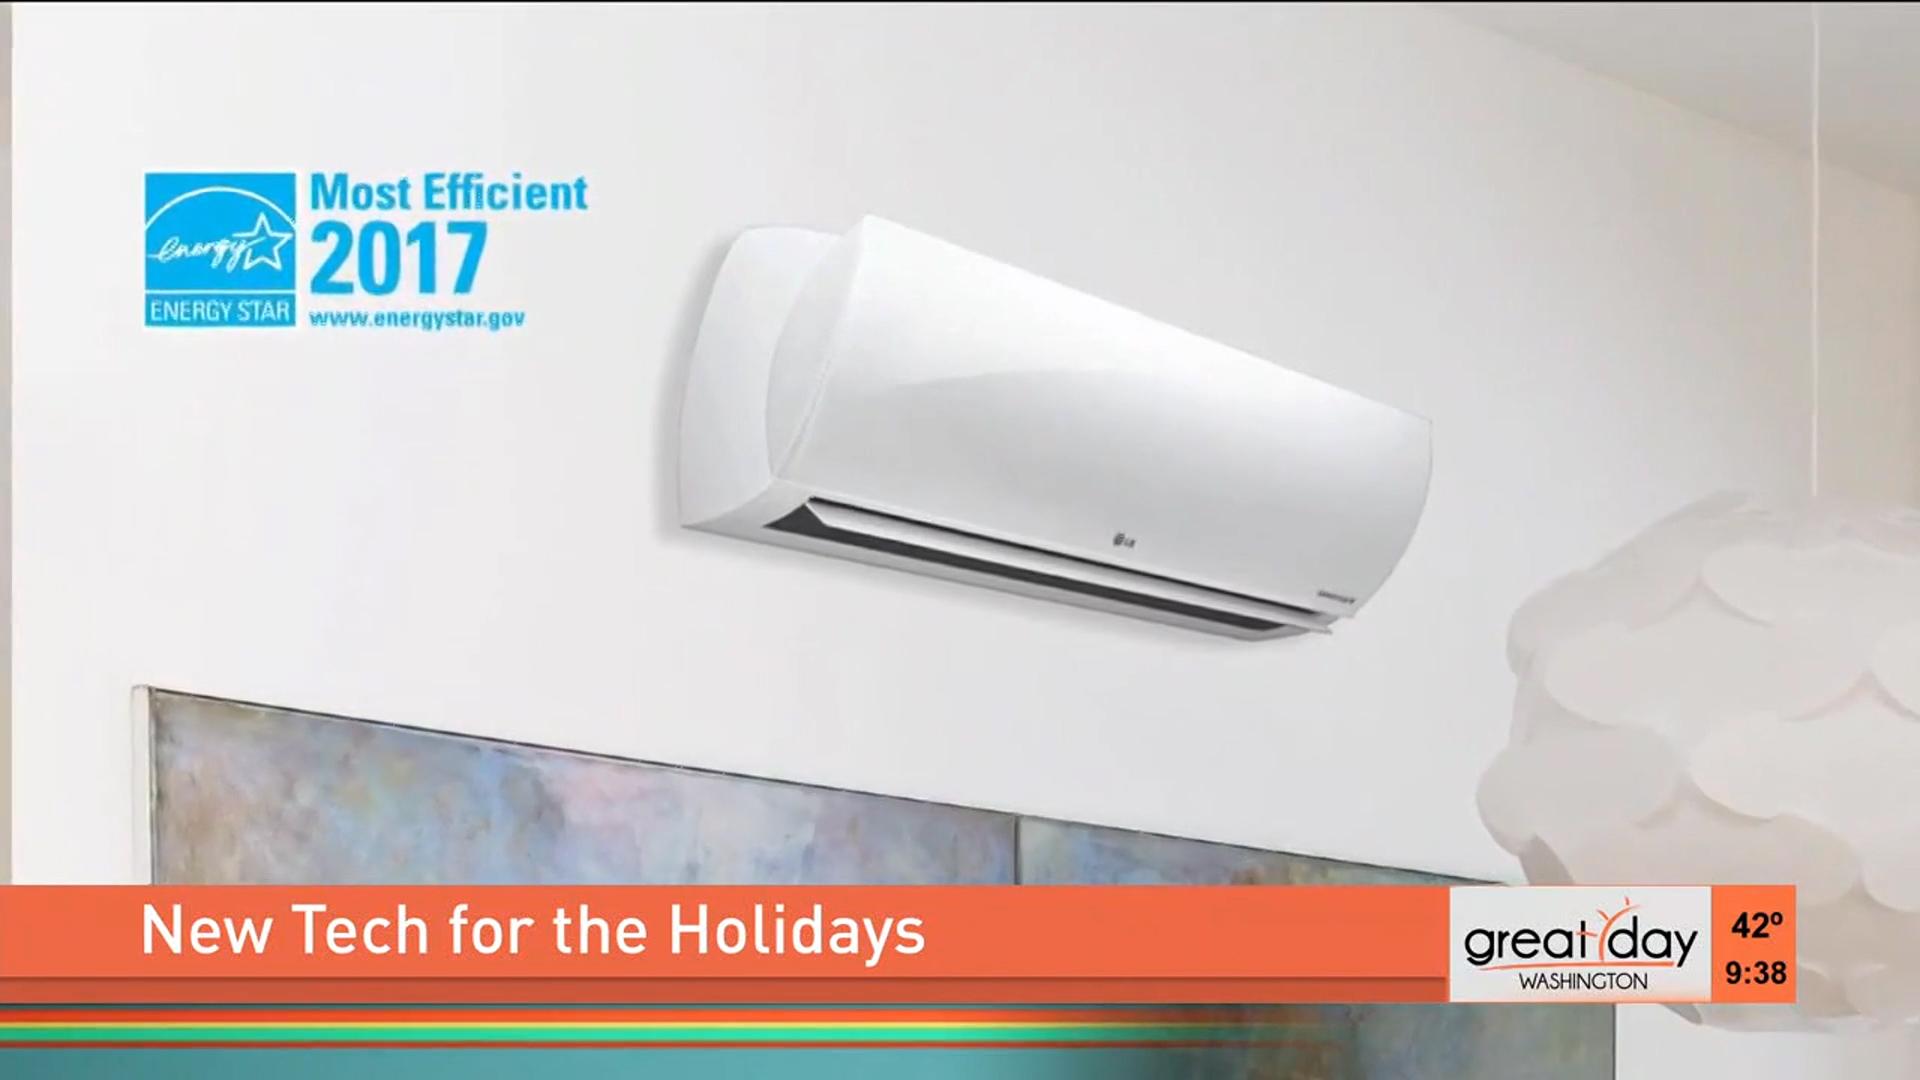 LGRED Heat Technology - Shop Now